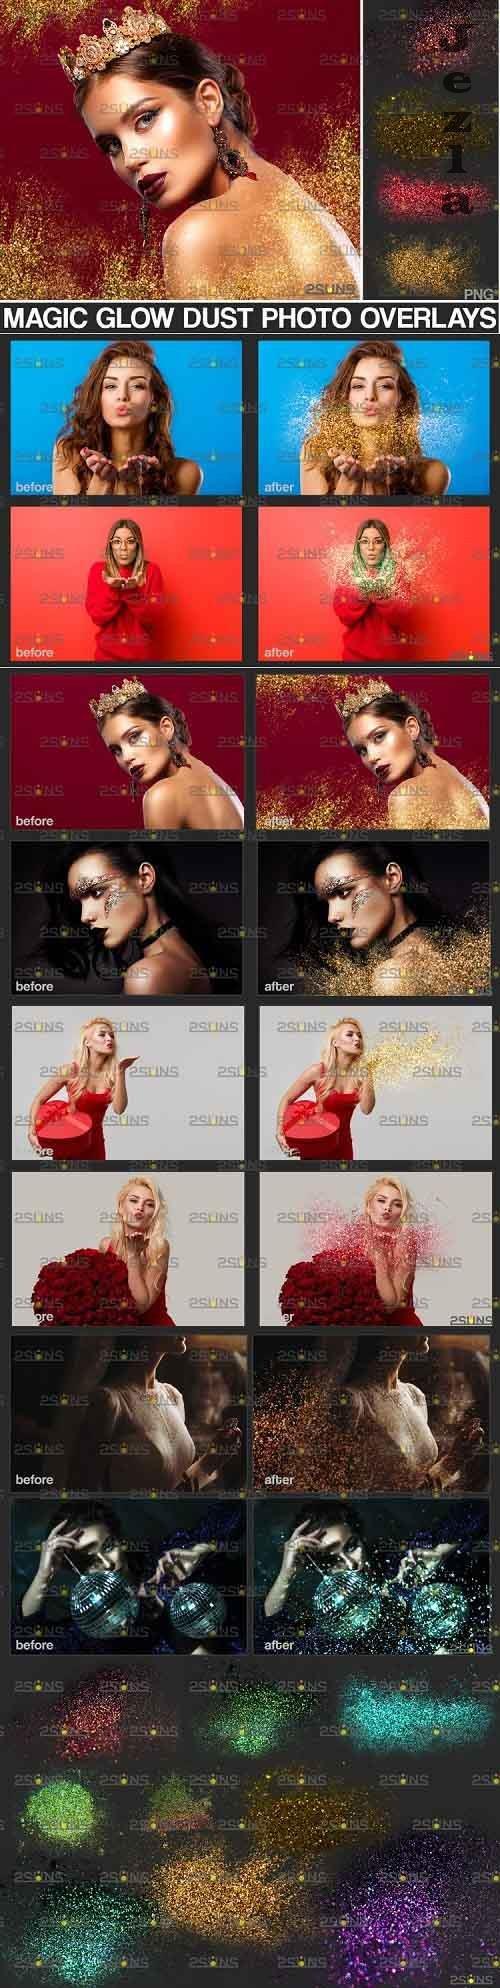 Blowing glitter overlay & PHSP overlay - 895349